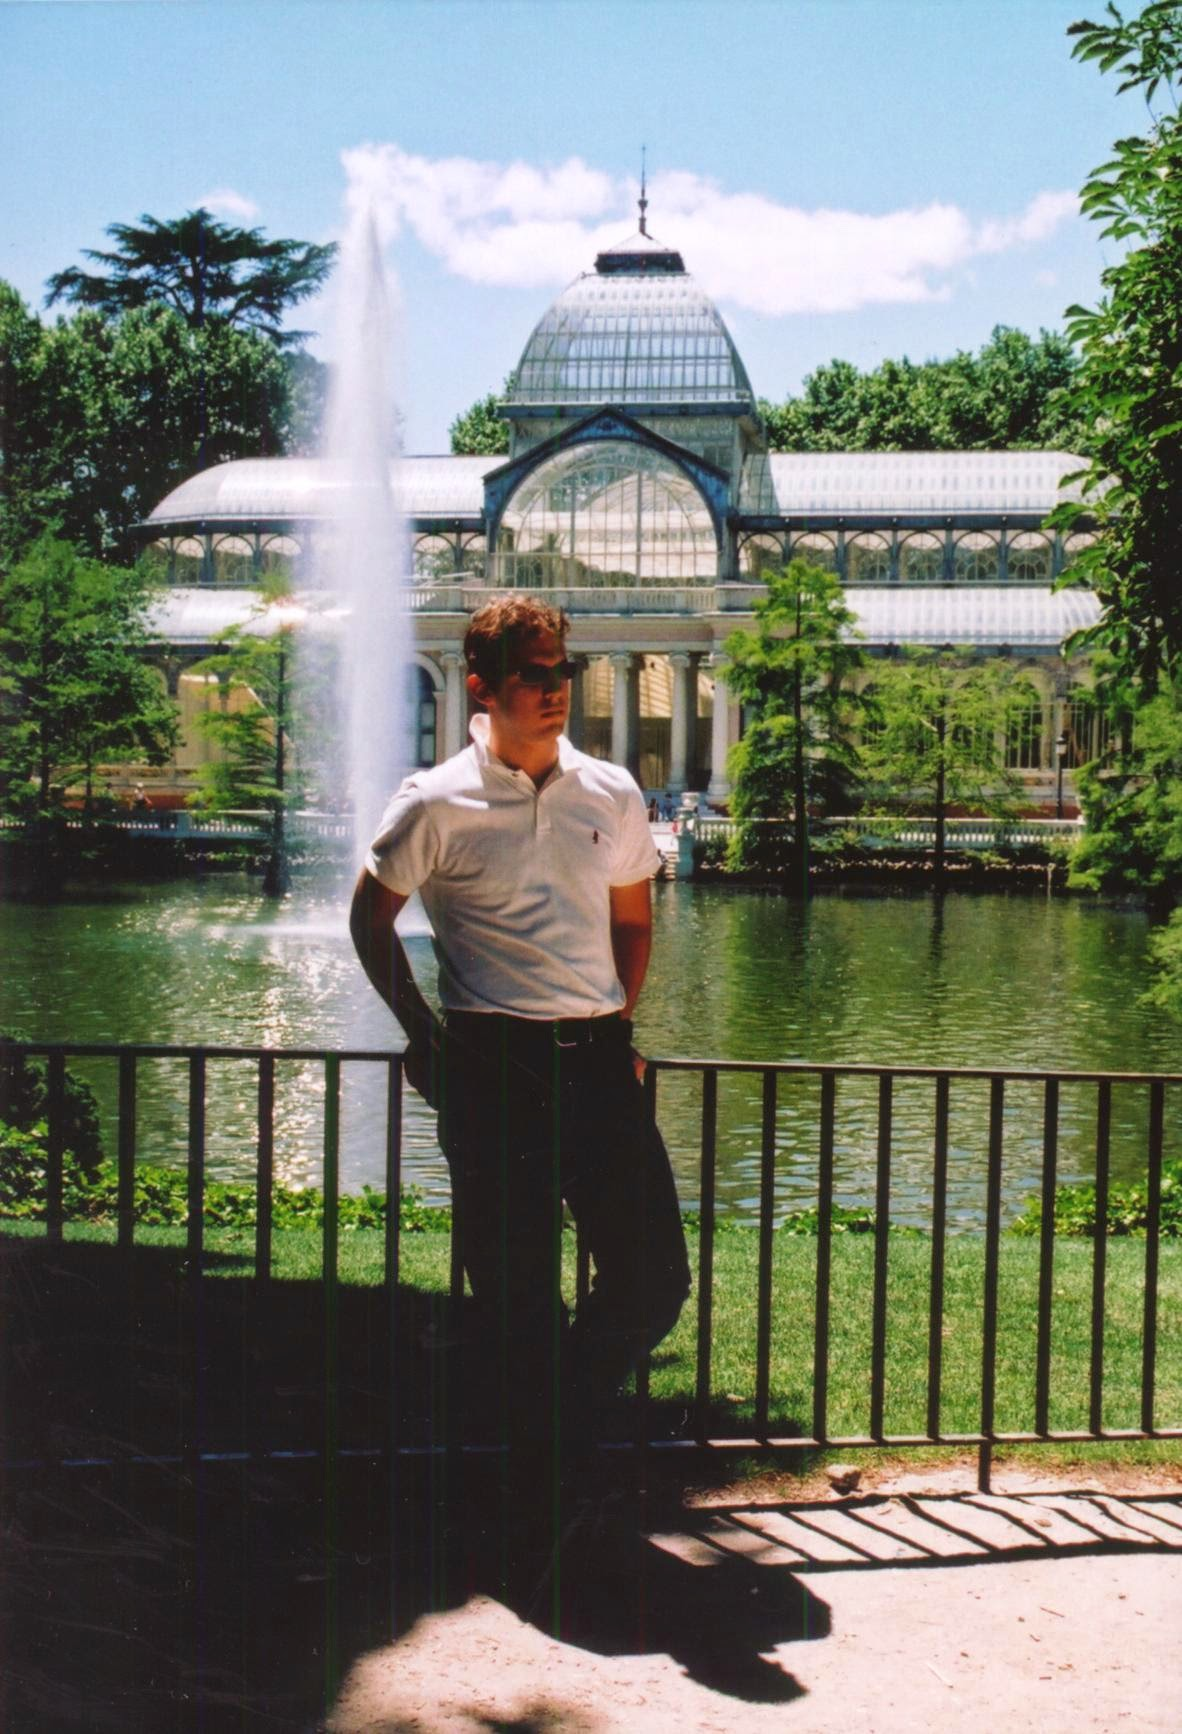 May 2002 – Parque del Retiro. Photo taken by my mom.